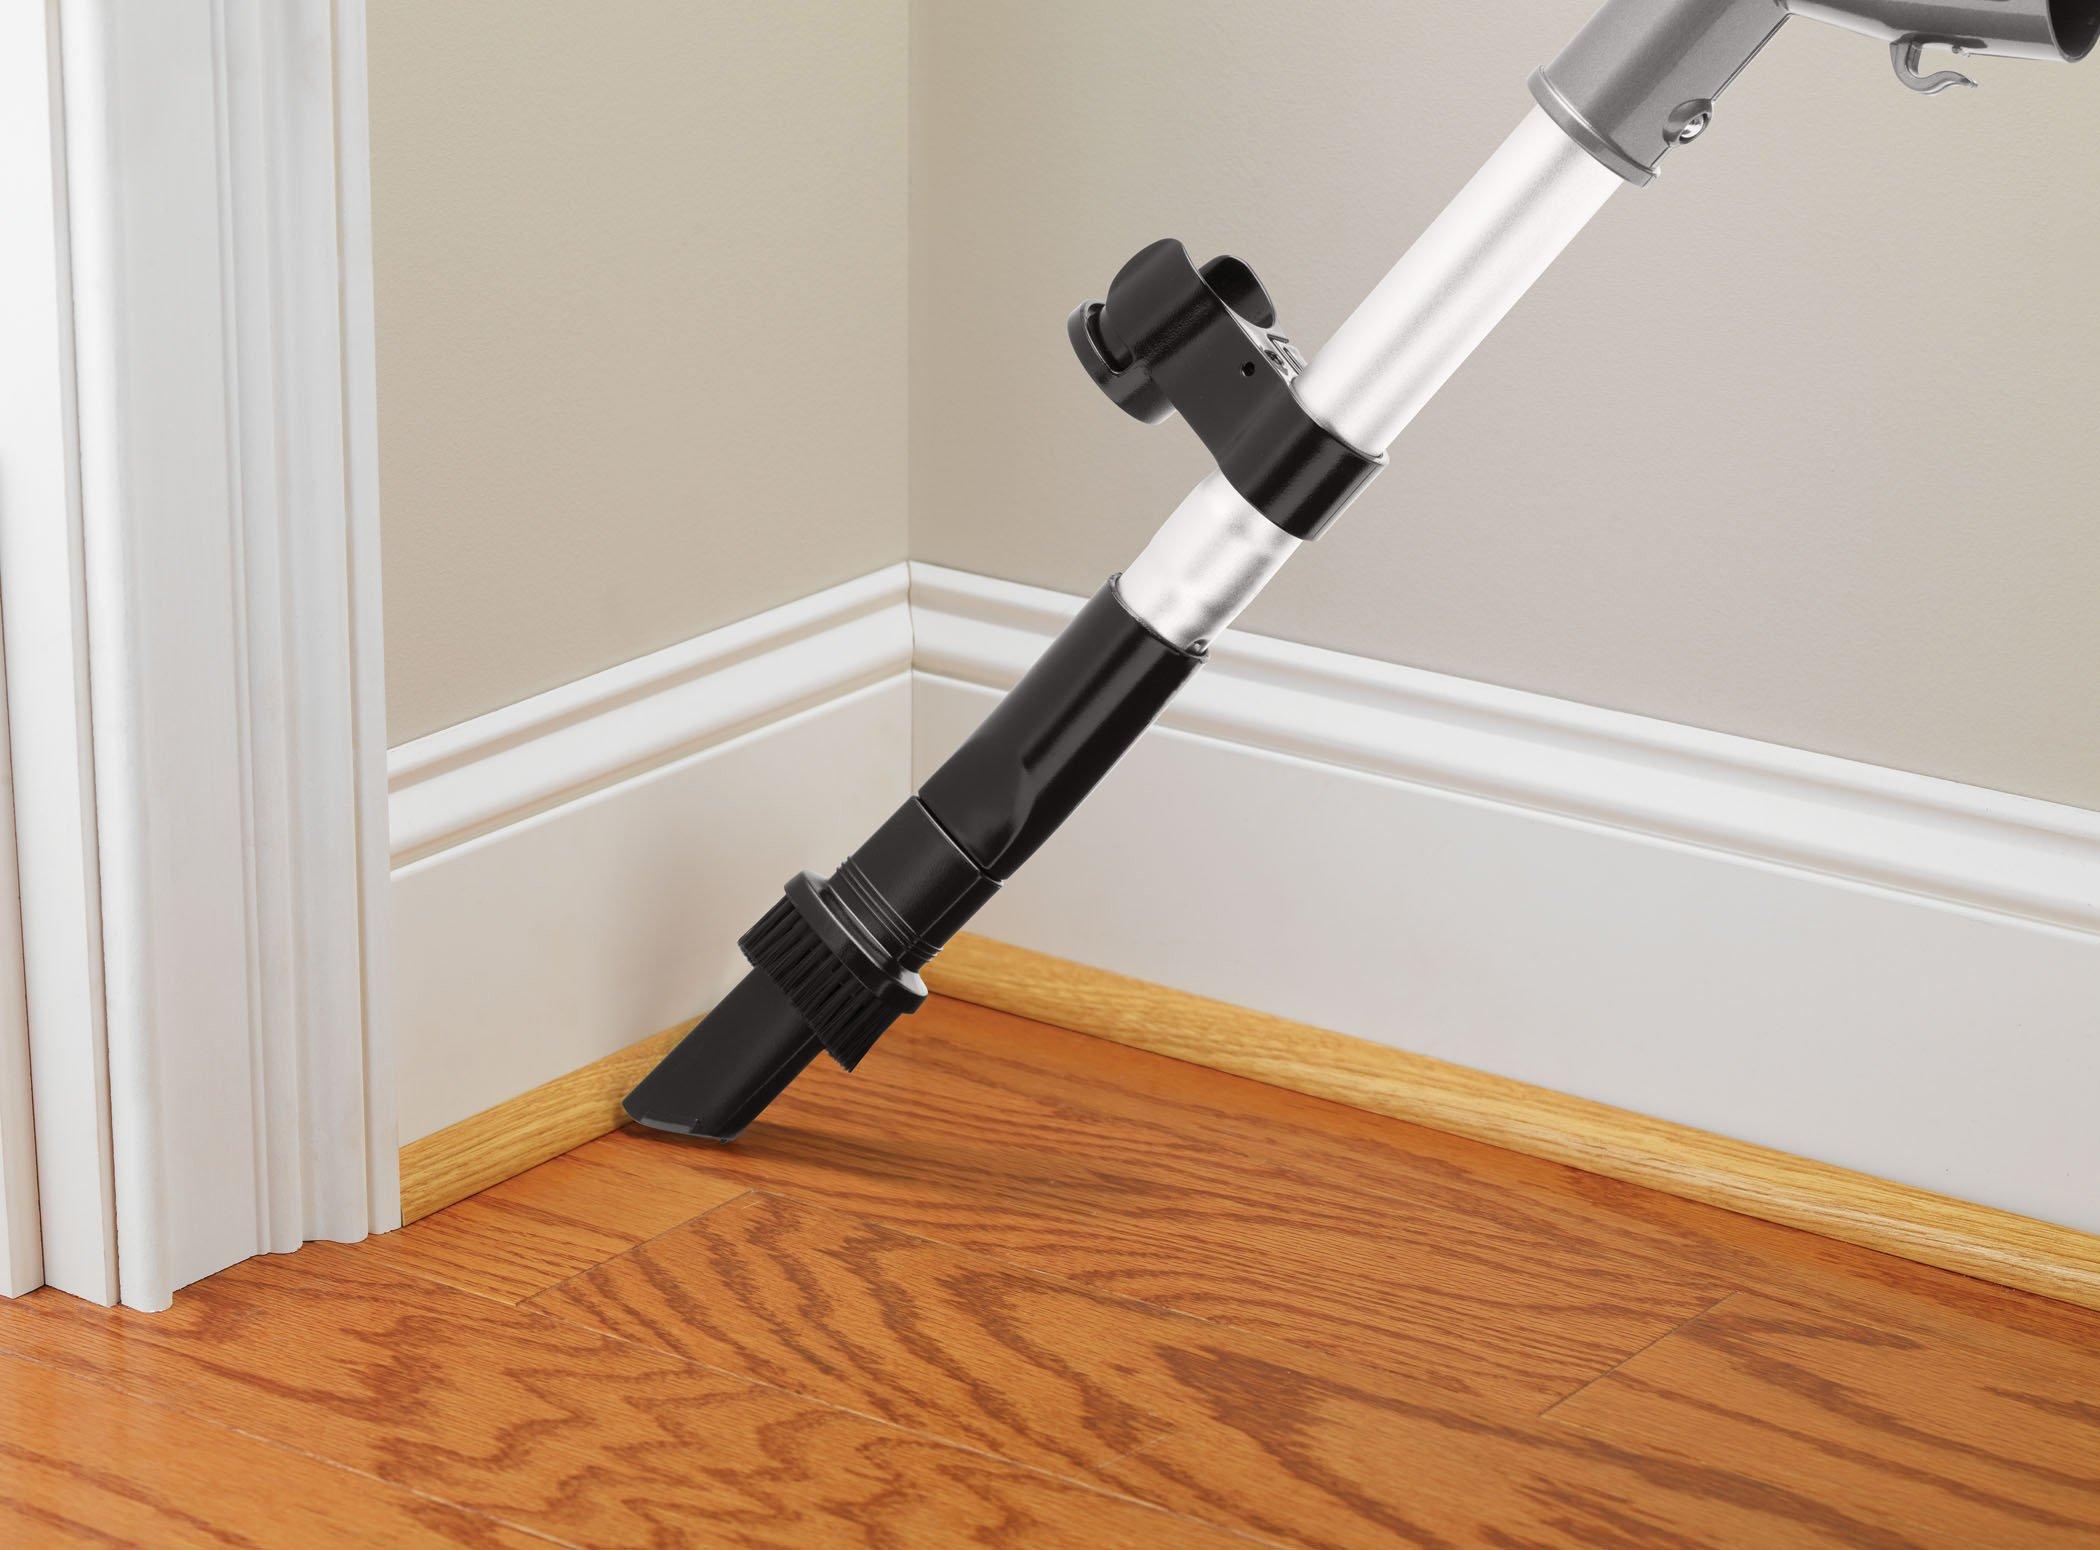 Swerve Lightweight Cyclonic Upright Vacuum5